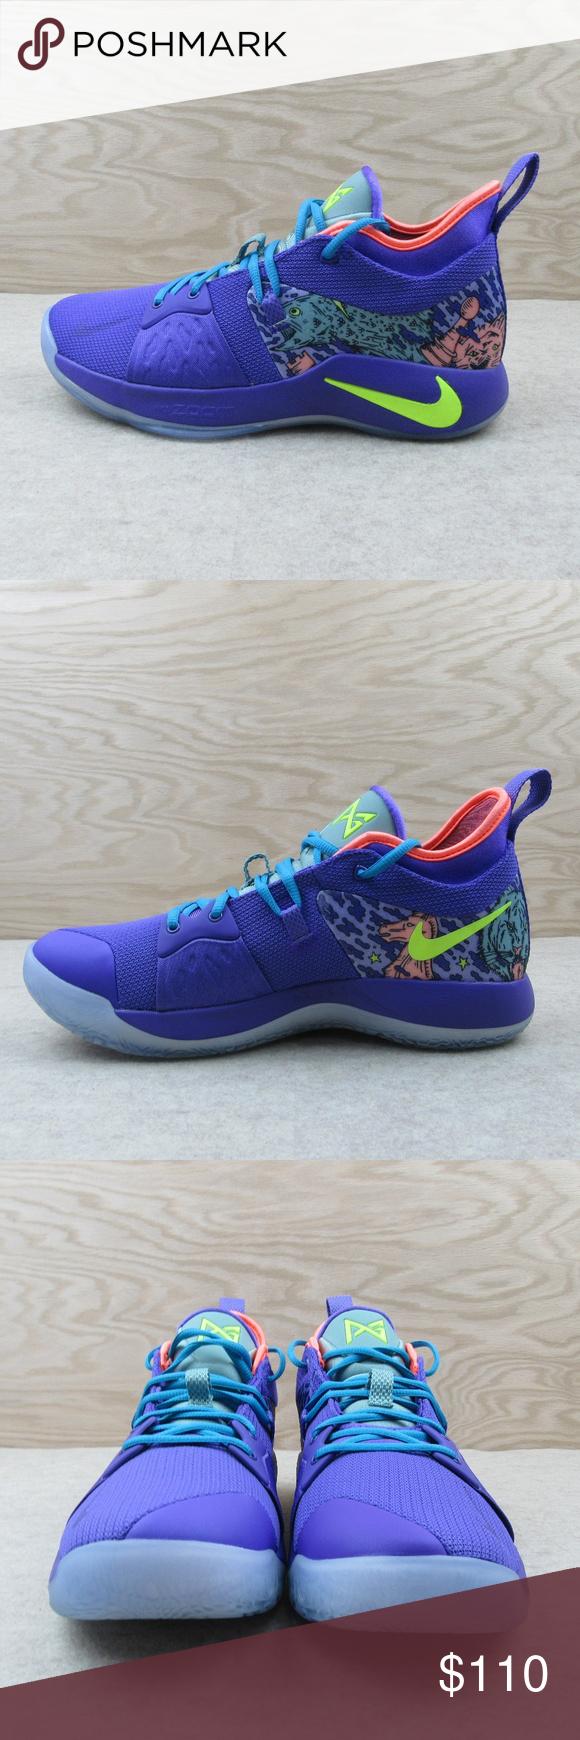 best website 61f23 d60b7 Nike PG 2 MM Mamba Mentality Venom Shoes Size 10.5 Nike PG 2 ...